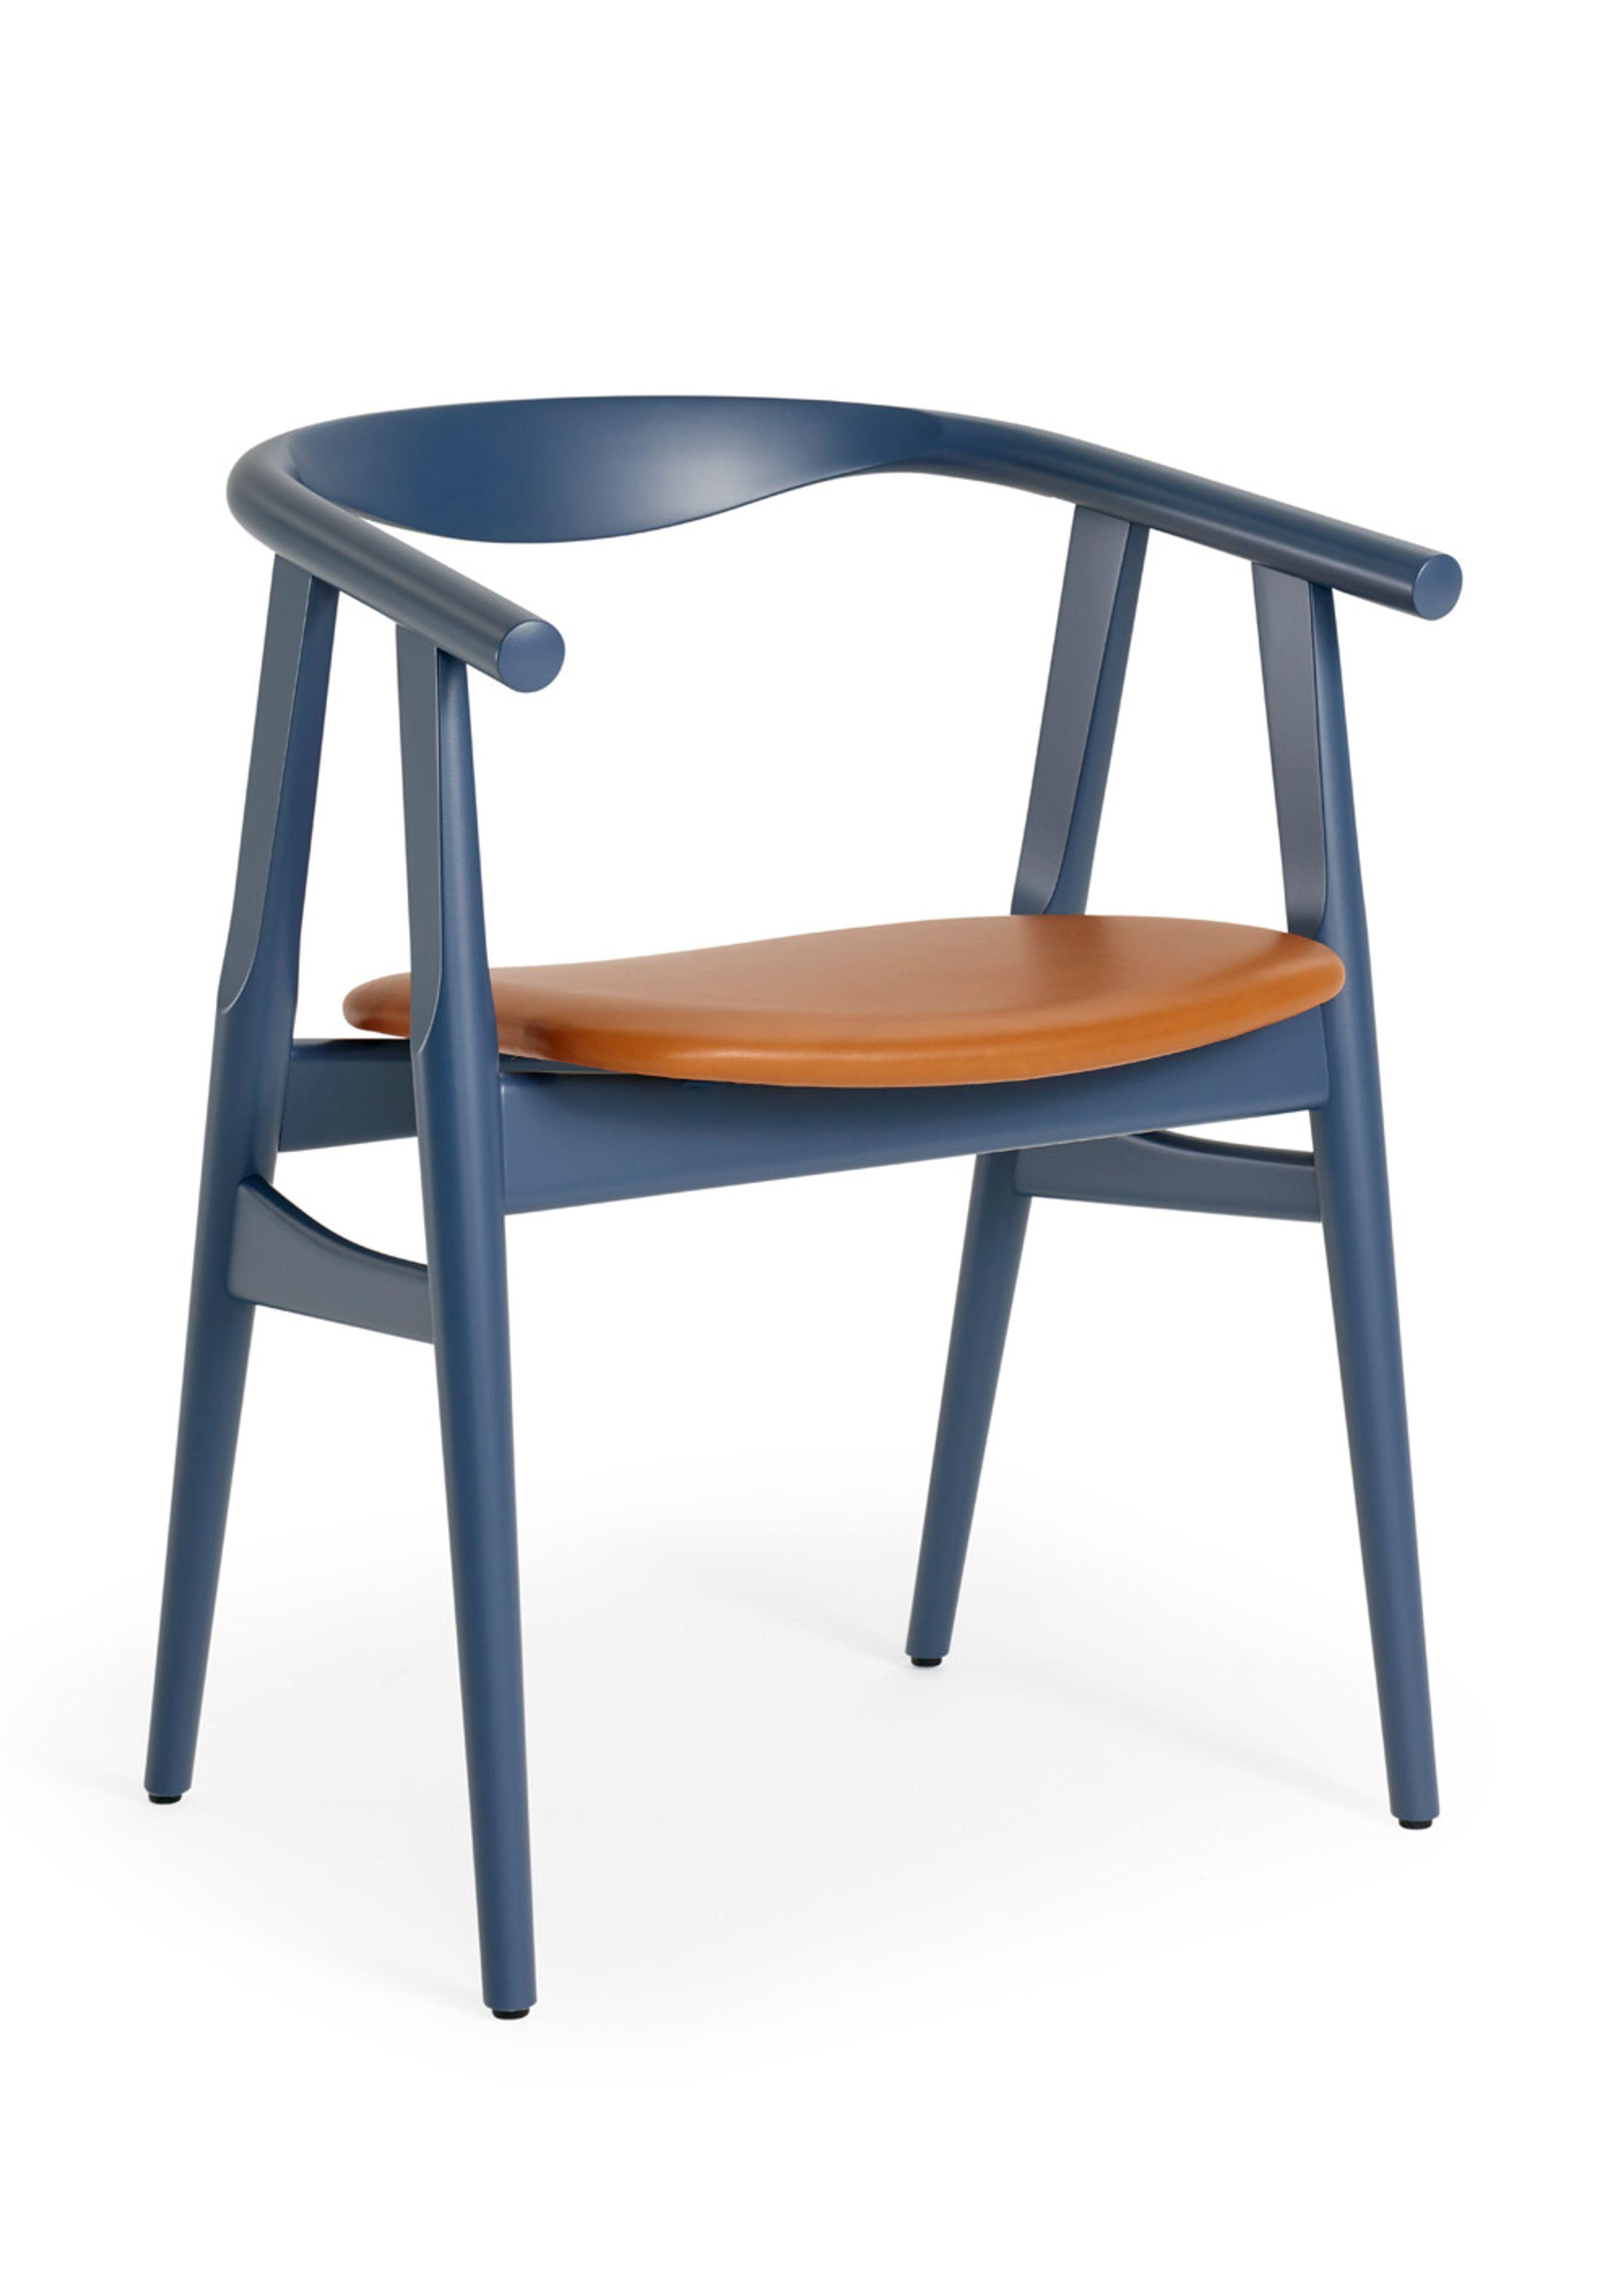 ... Getama   Stuhl   GE525 / The U Chair / By Hans J. Wegner ...